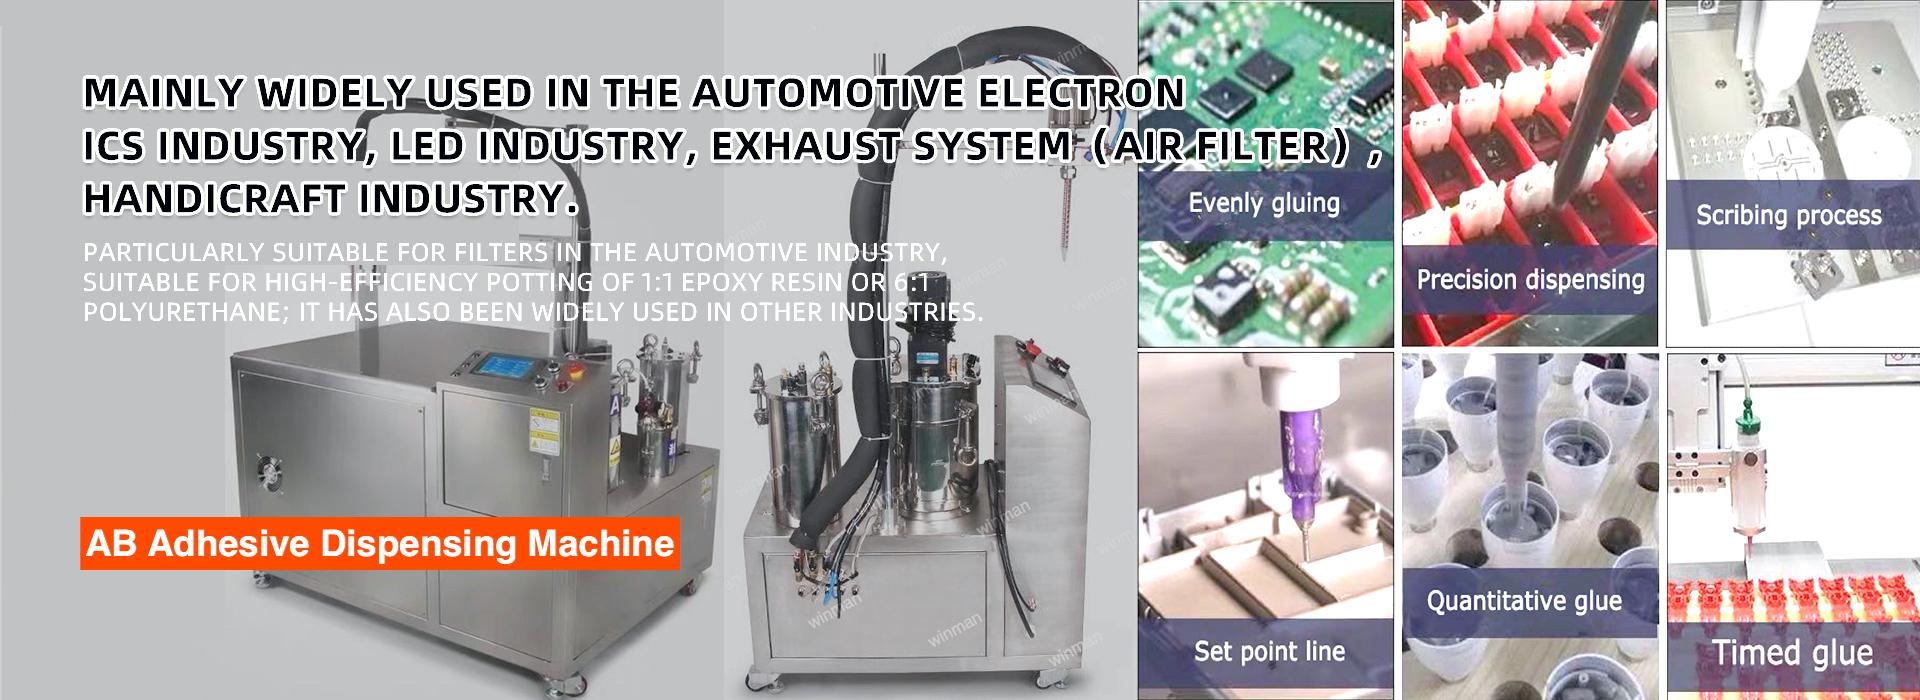 AB adhesive dispensing machine